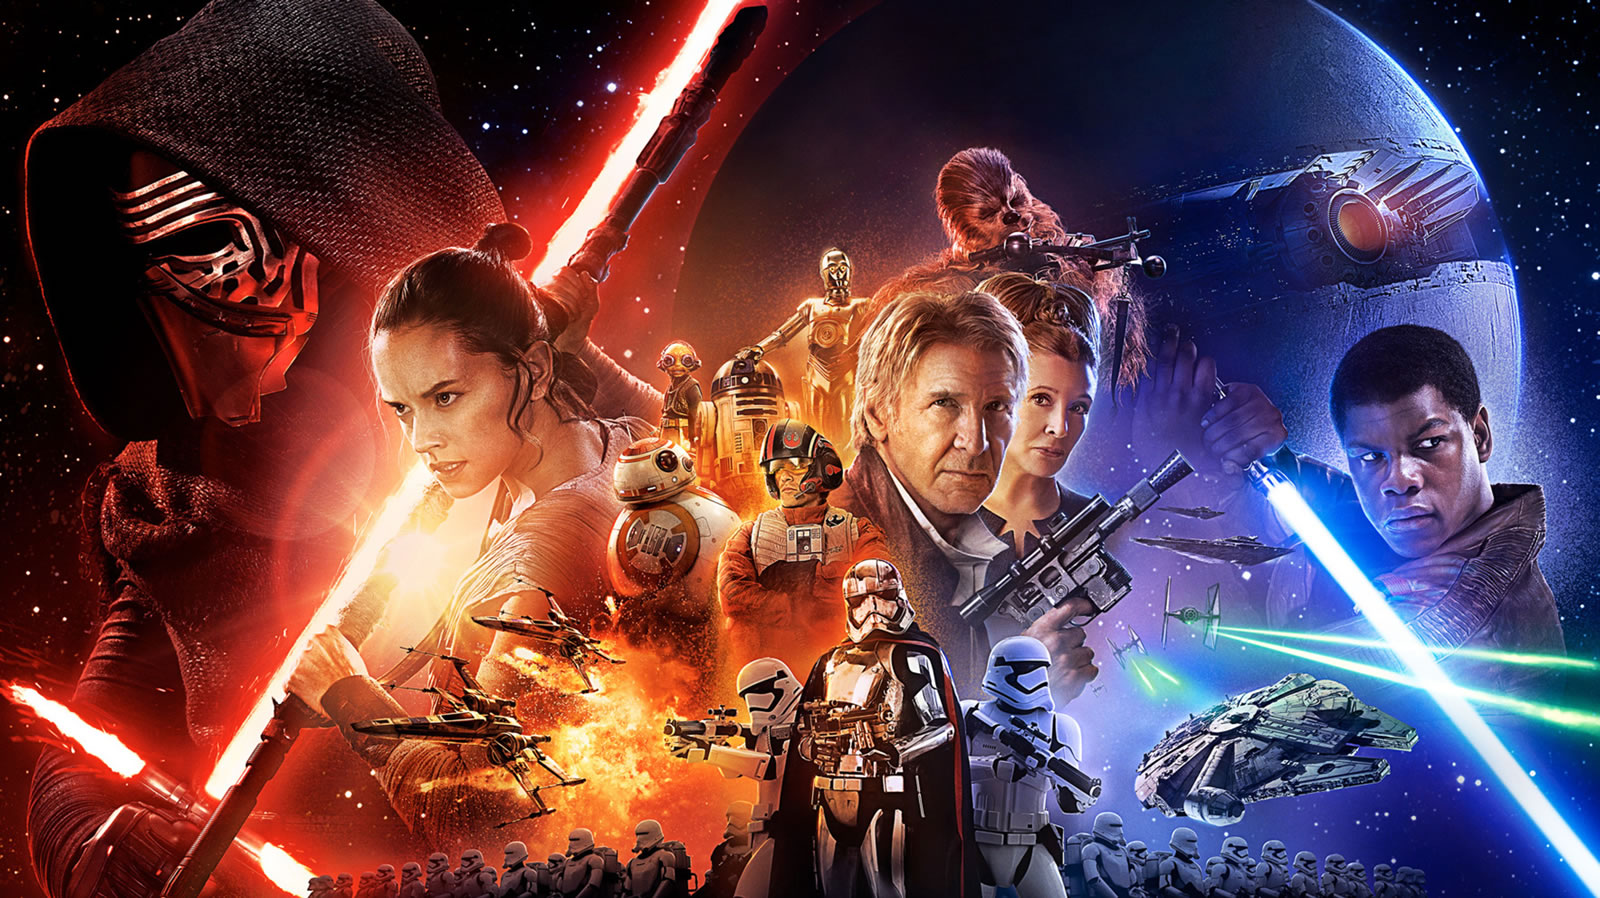 Star Wars Windows 10 Wallpaper Wallpapersafari